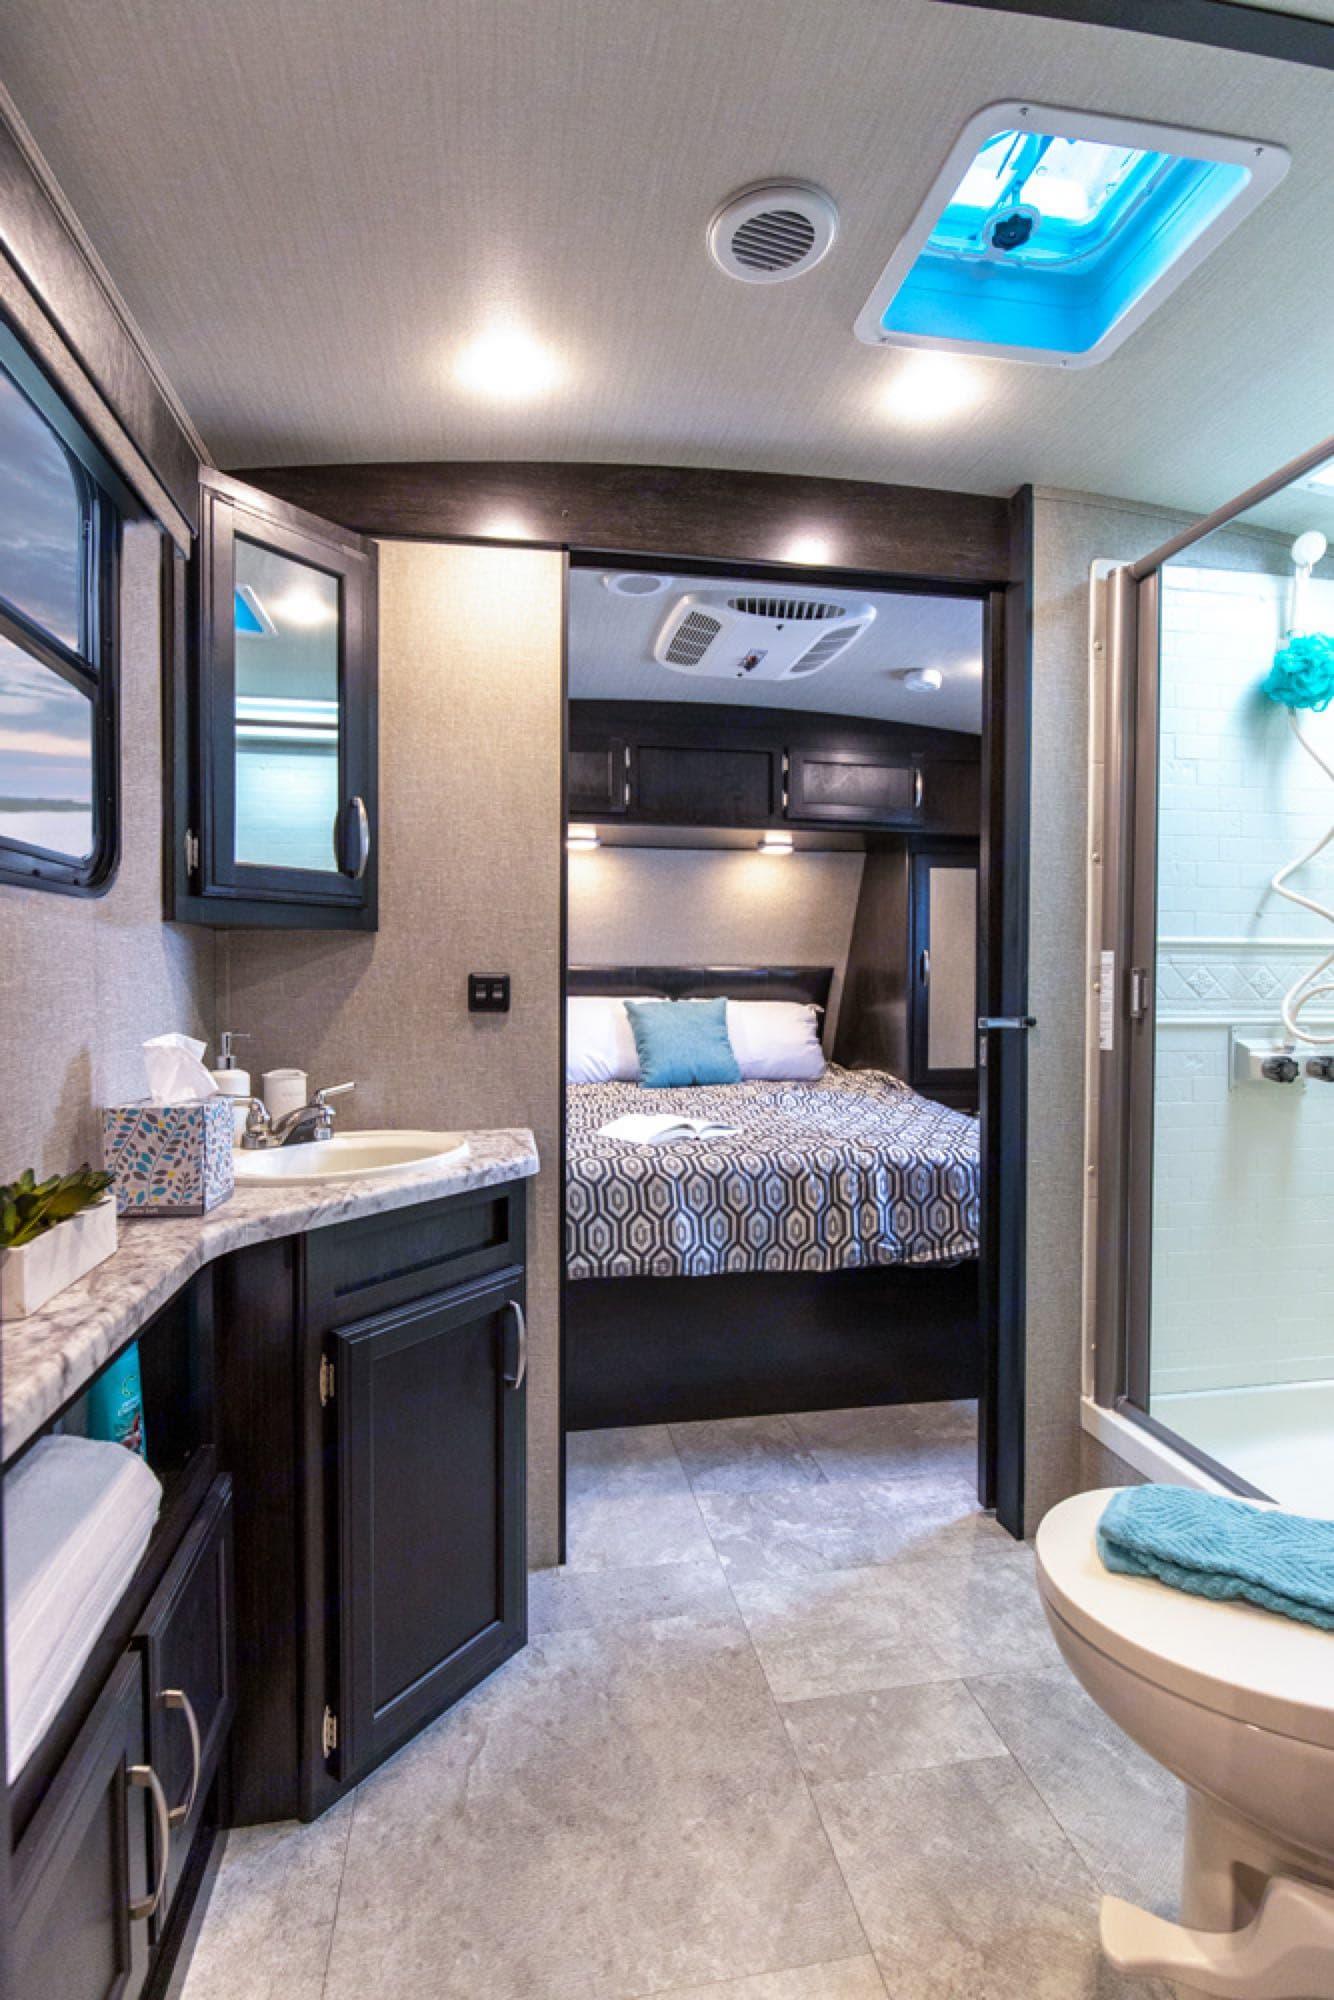 Grand Design Imagine 3000QB 2019